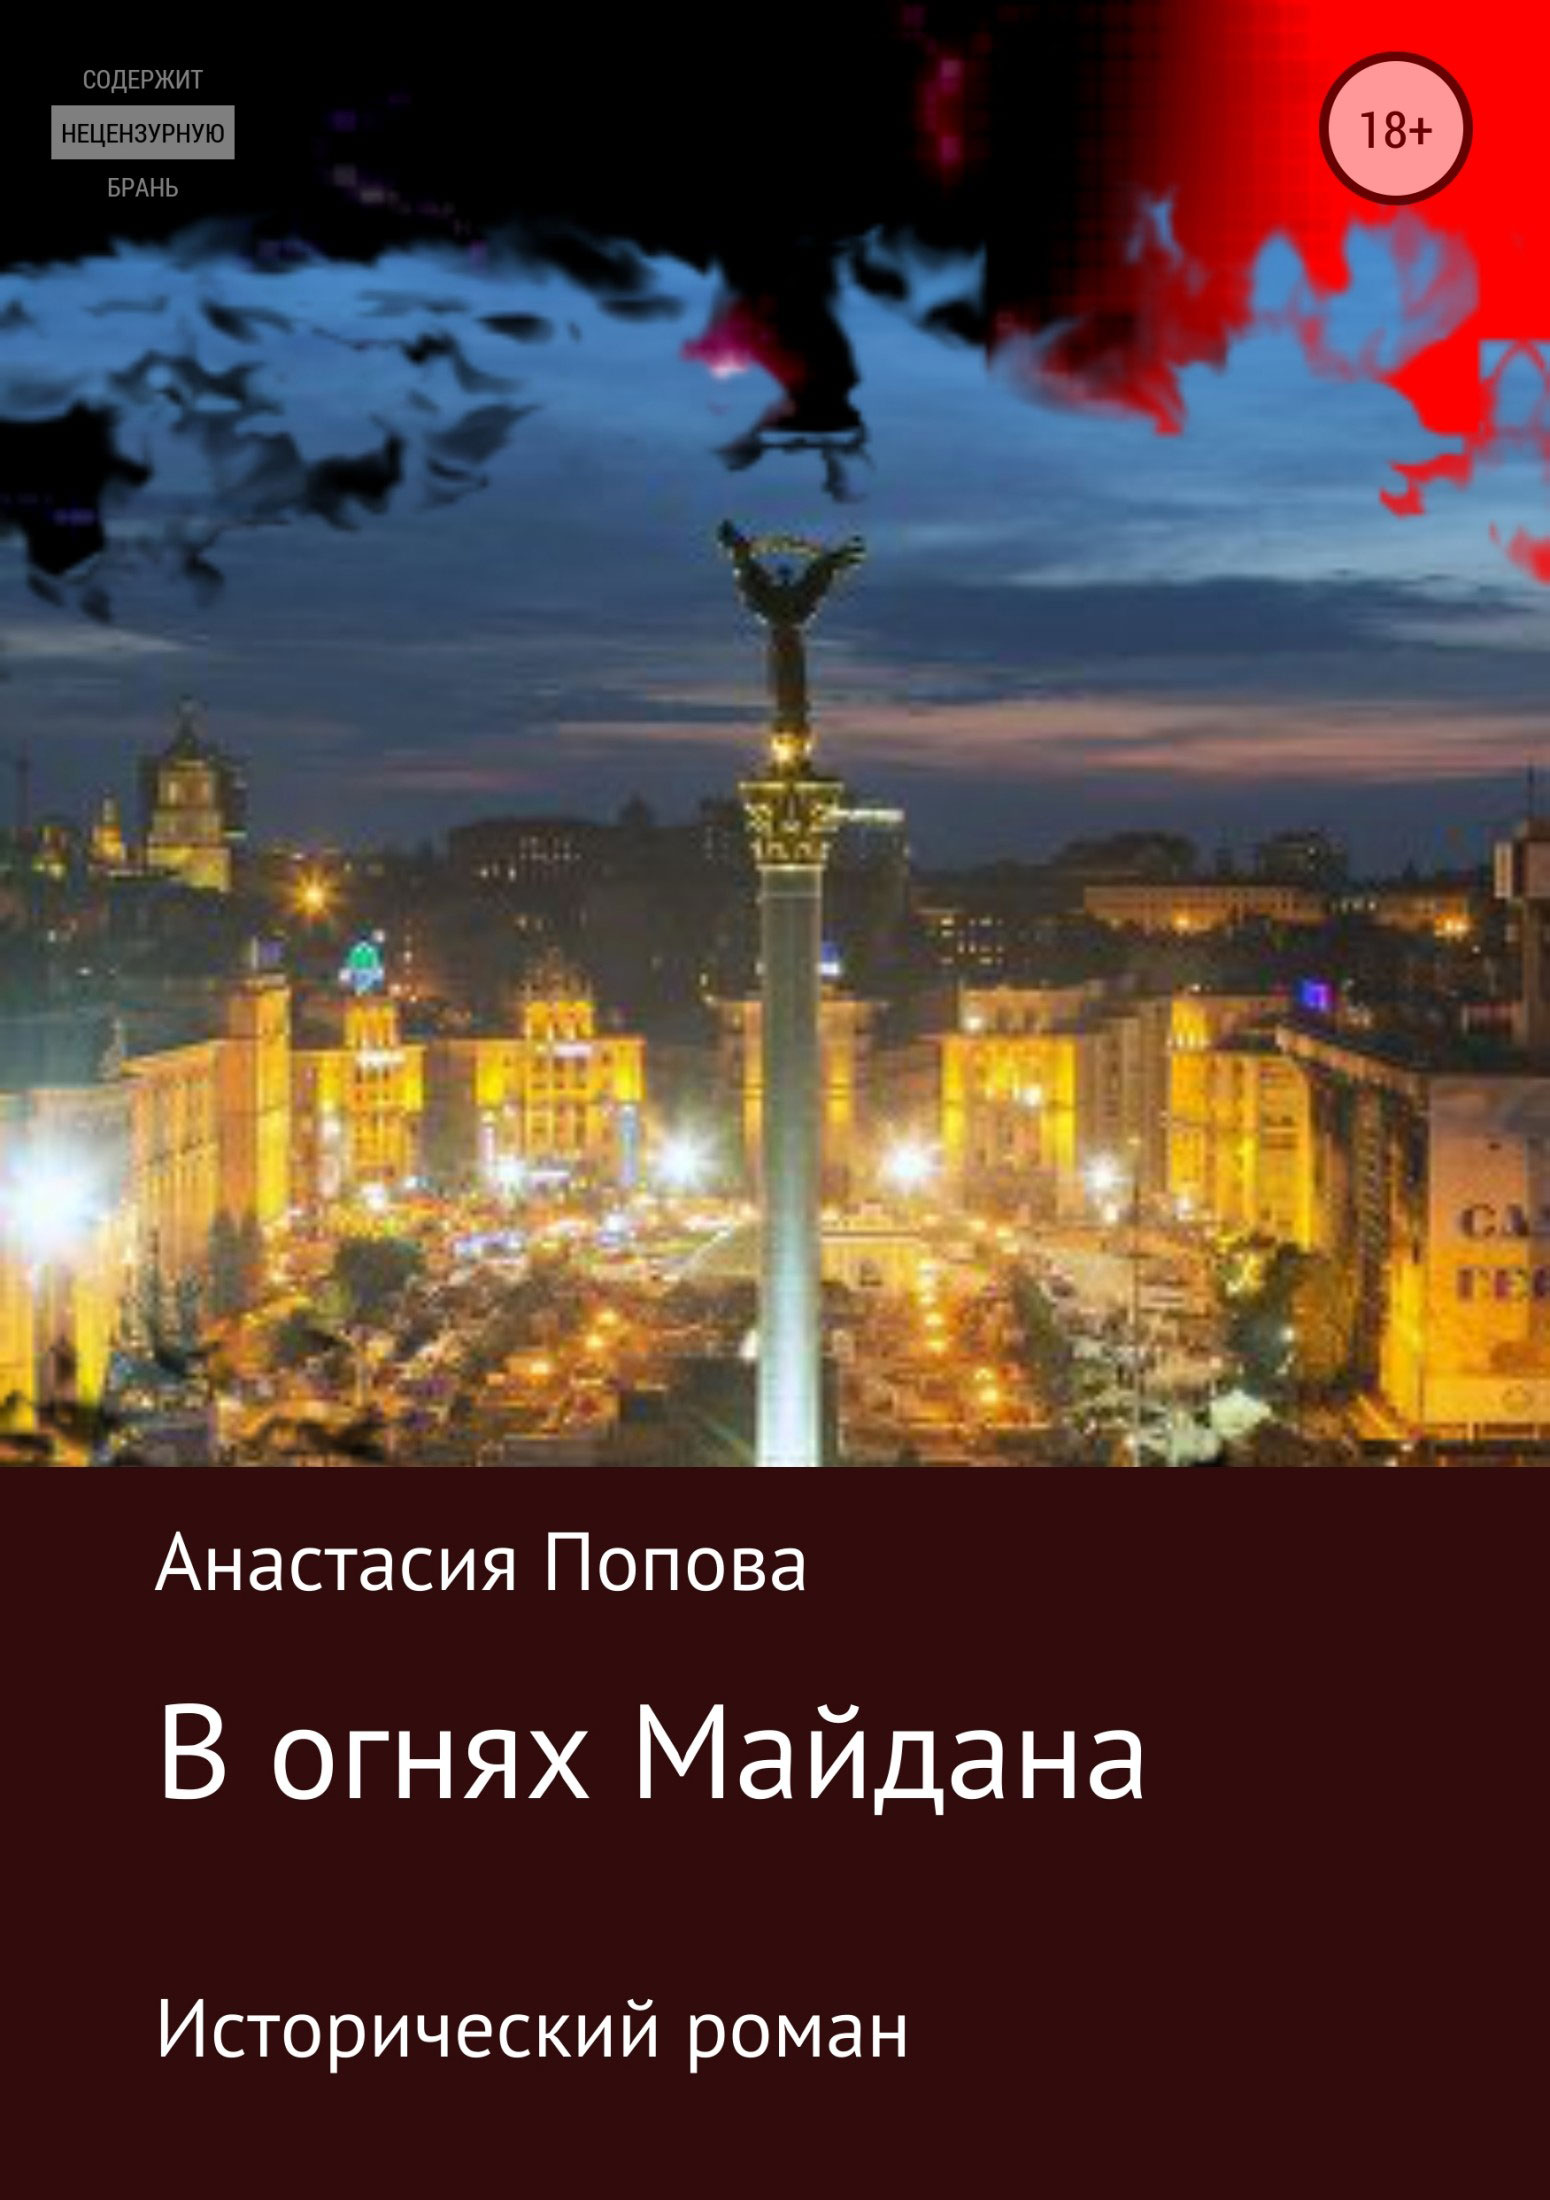 Анастасия Алексеевна Попова В огнях Майдана